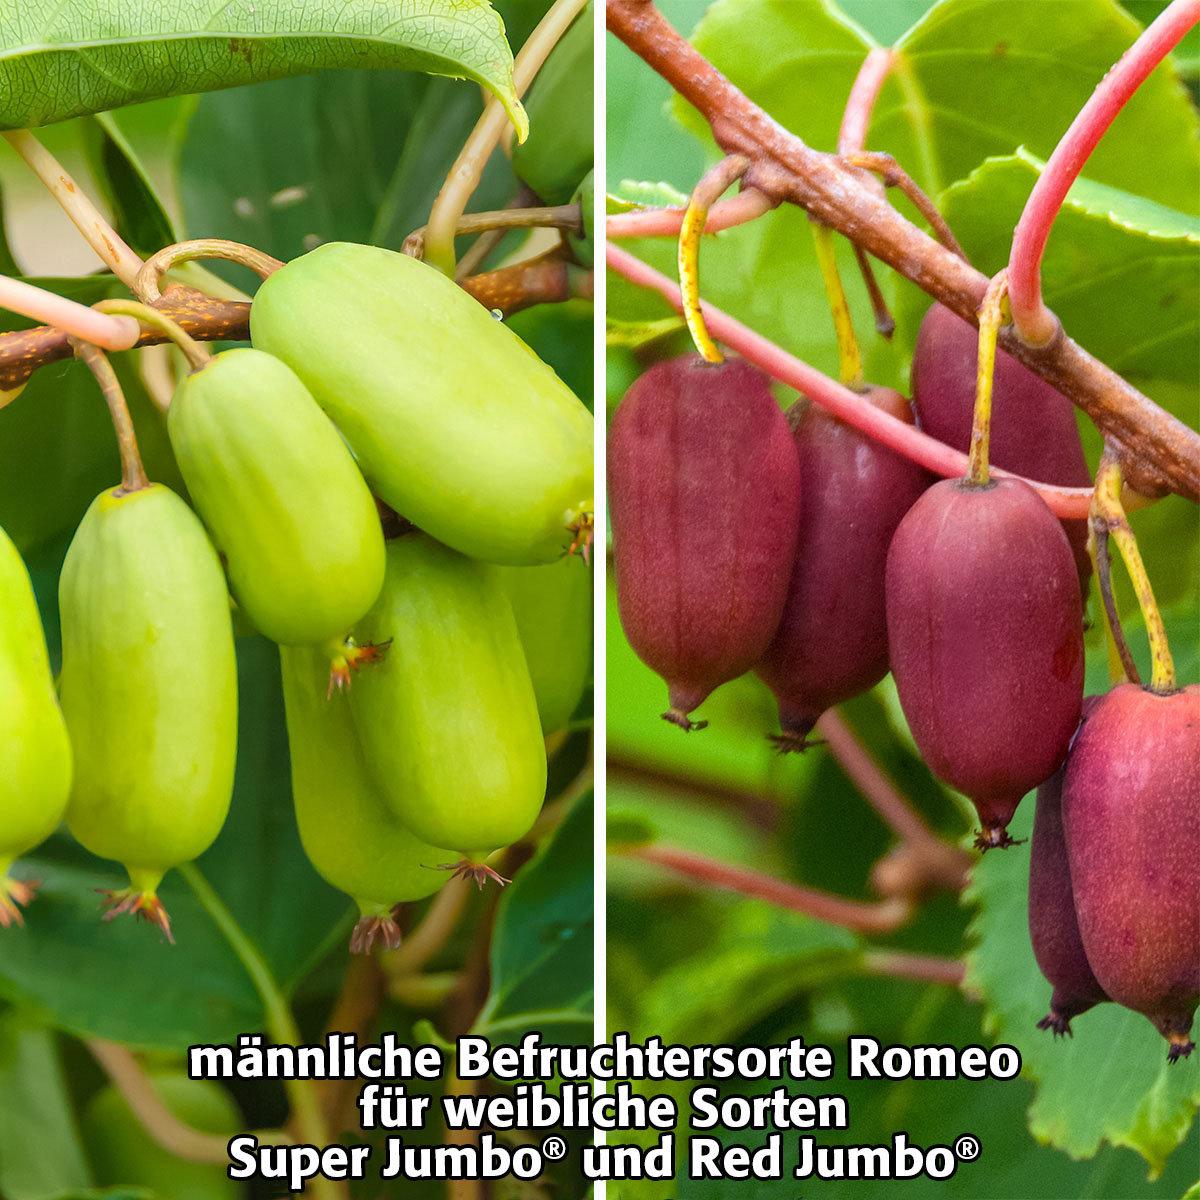 kiwi berry romeo online kaufen bei g rtner p tschke. Black Bedroom Furniture Sets. Home Design Ideas